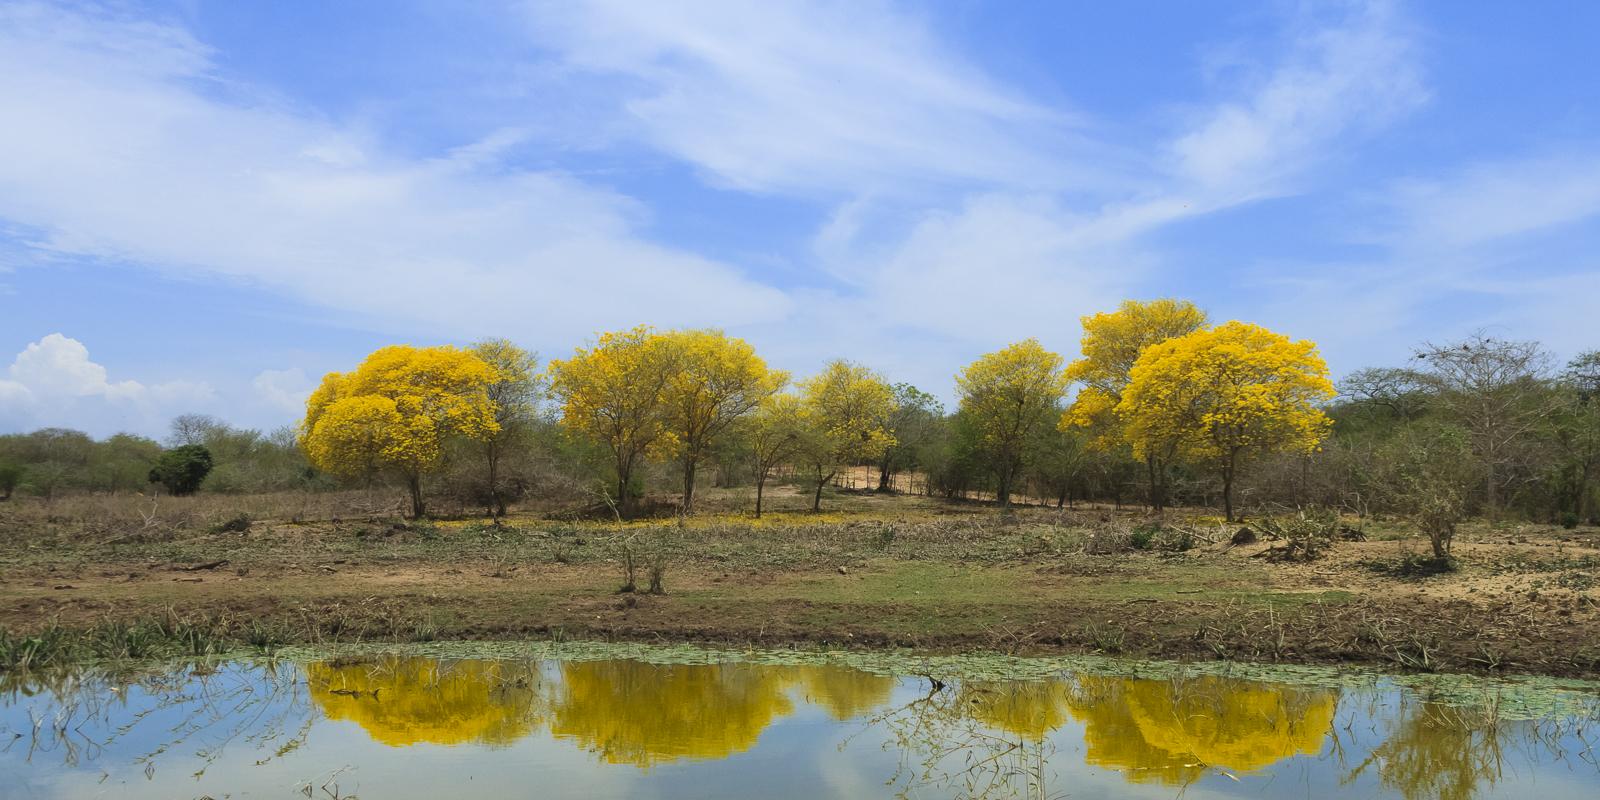 Jairo A Llano - fotografo paisaje-7831.jpg